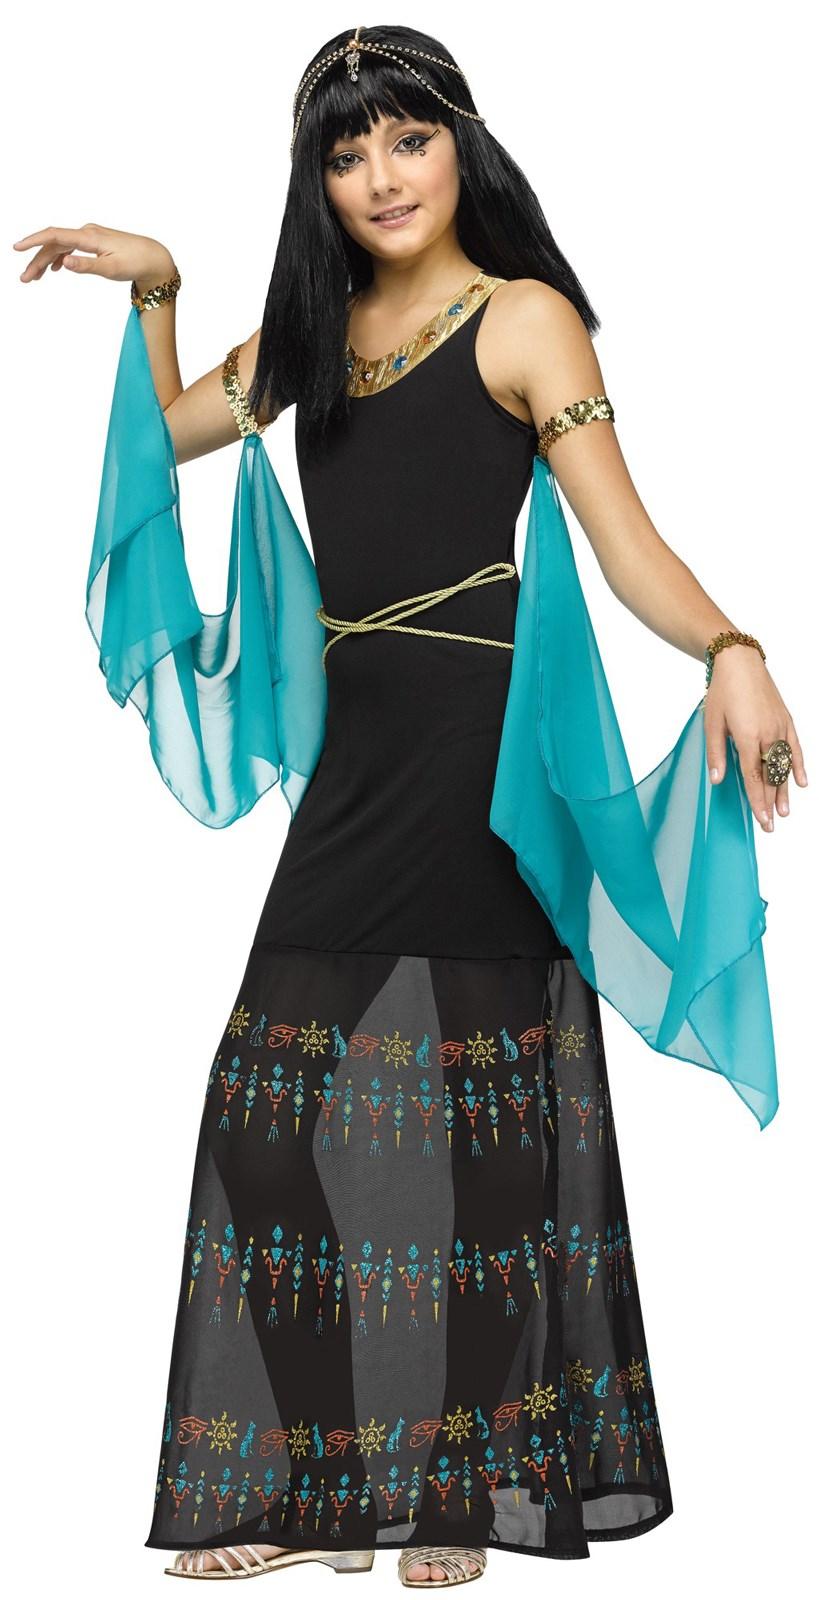 Egyptian Queen Costume For Girls